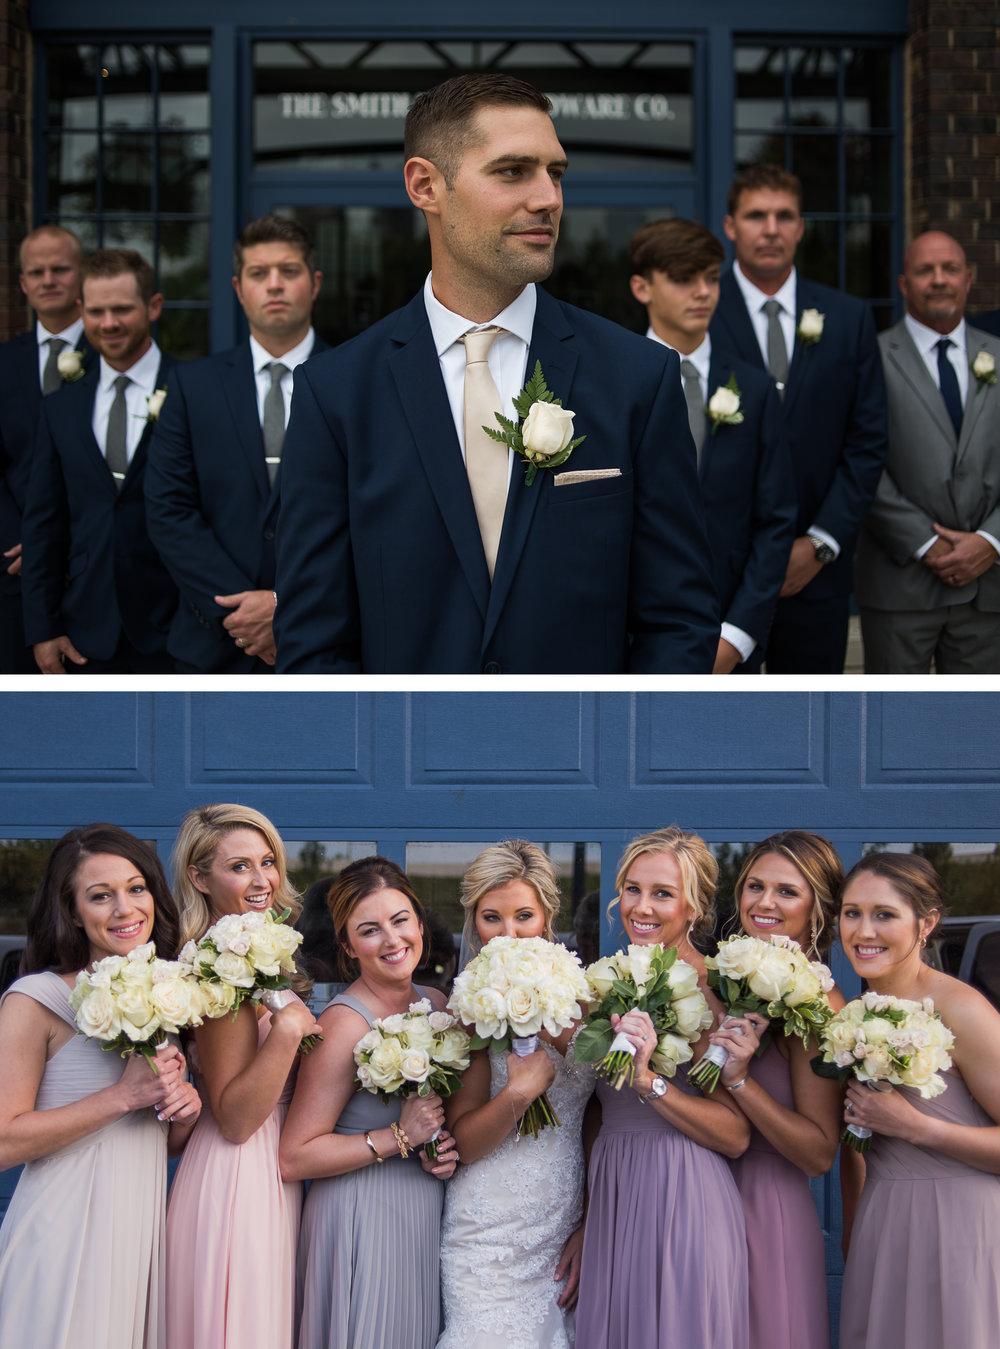 Columbus Wedding Photographer, Columbus Wedding Photography, Groomsmen, Brett Loves Elle Photography